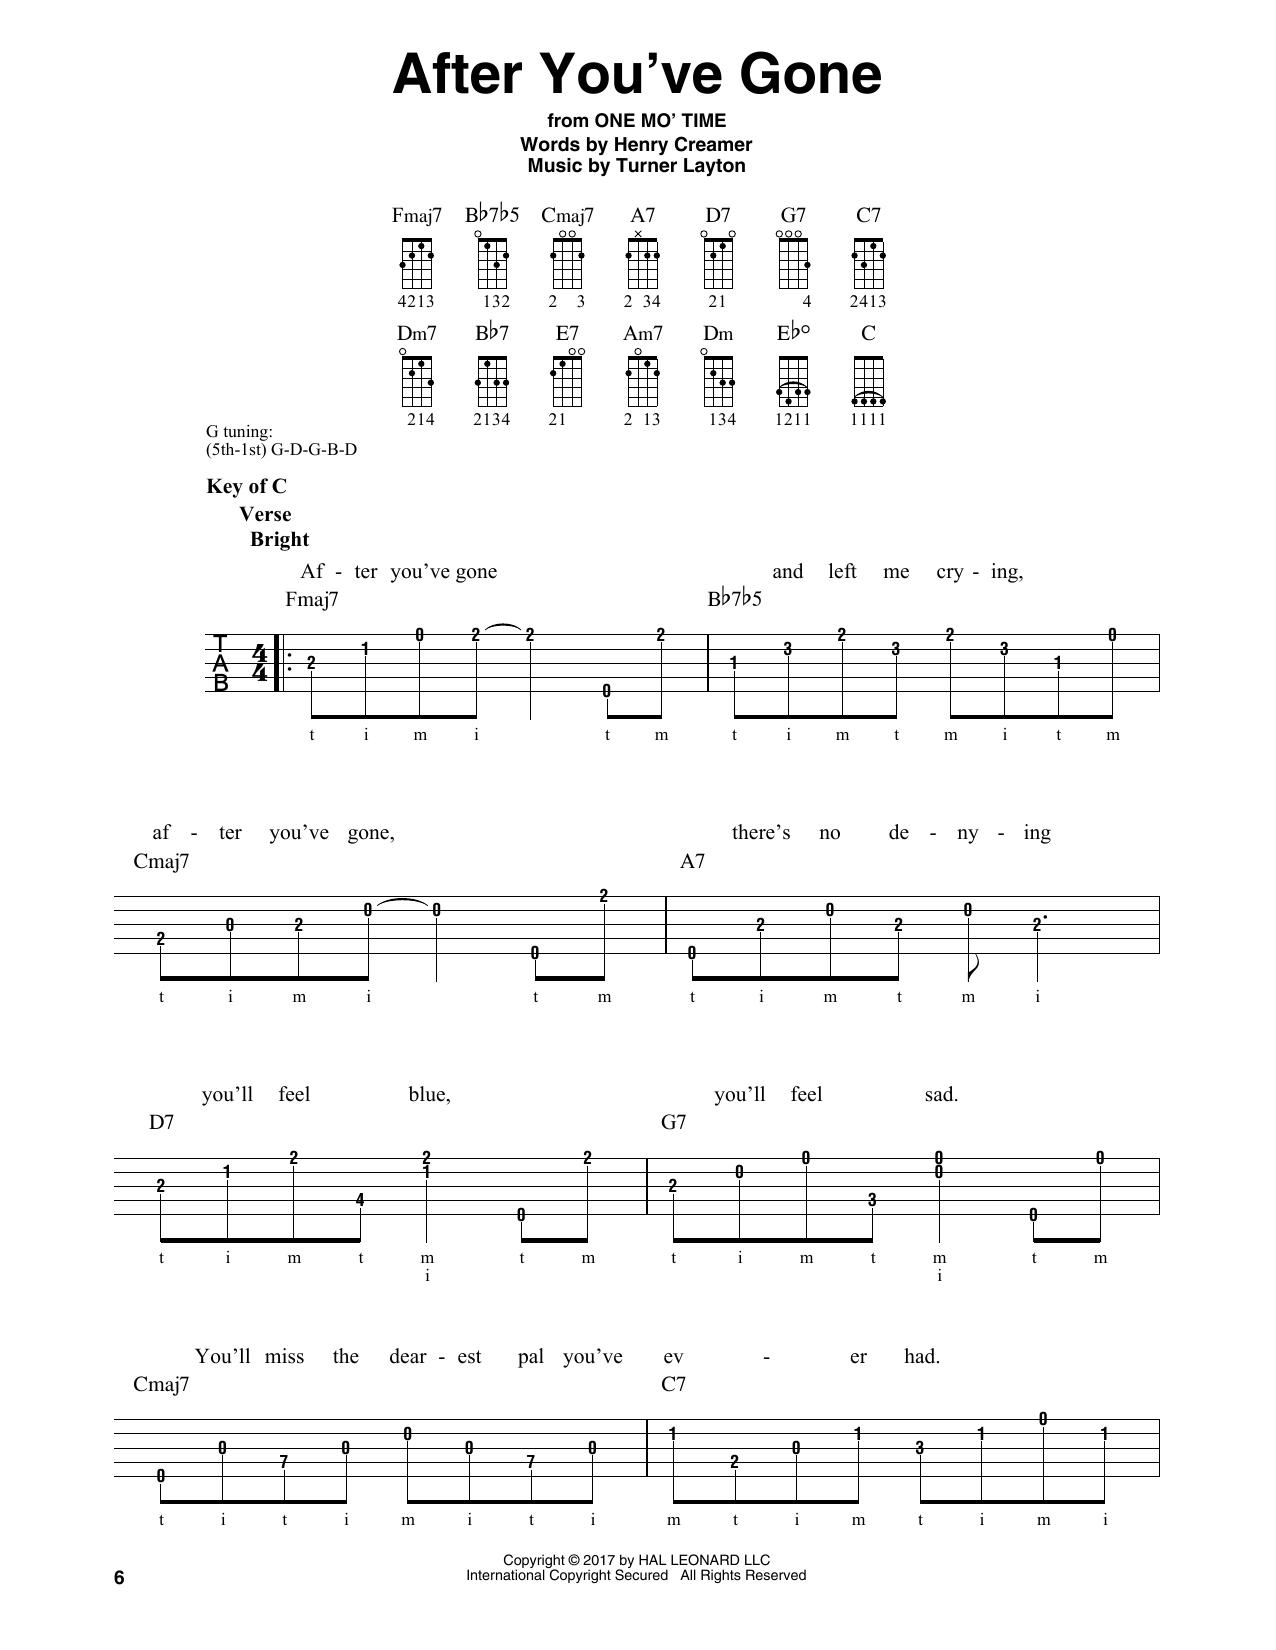 Sheet Music Digital Files To Print Licensed Spanish Digital Sheet